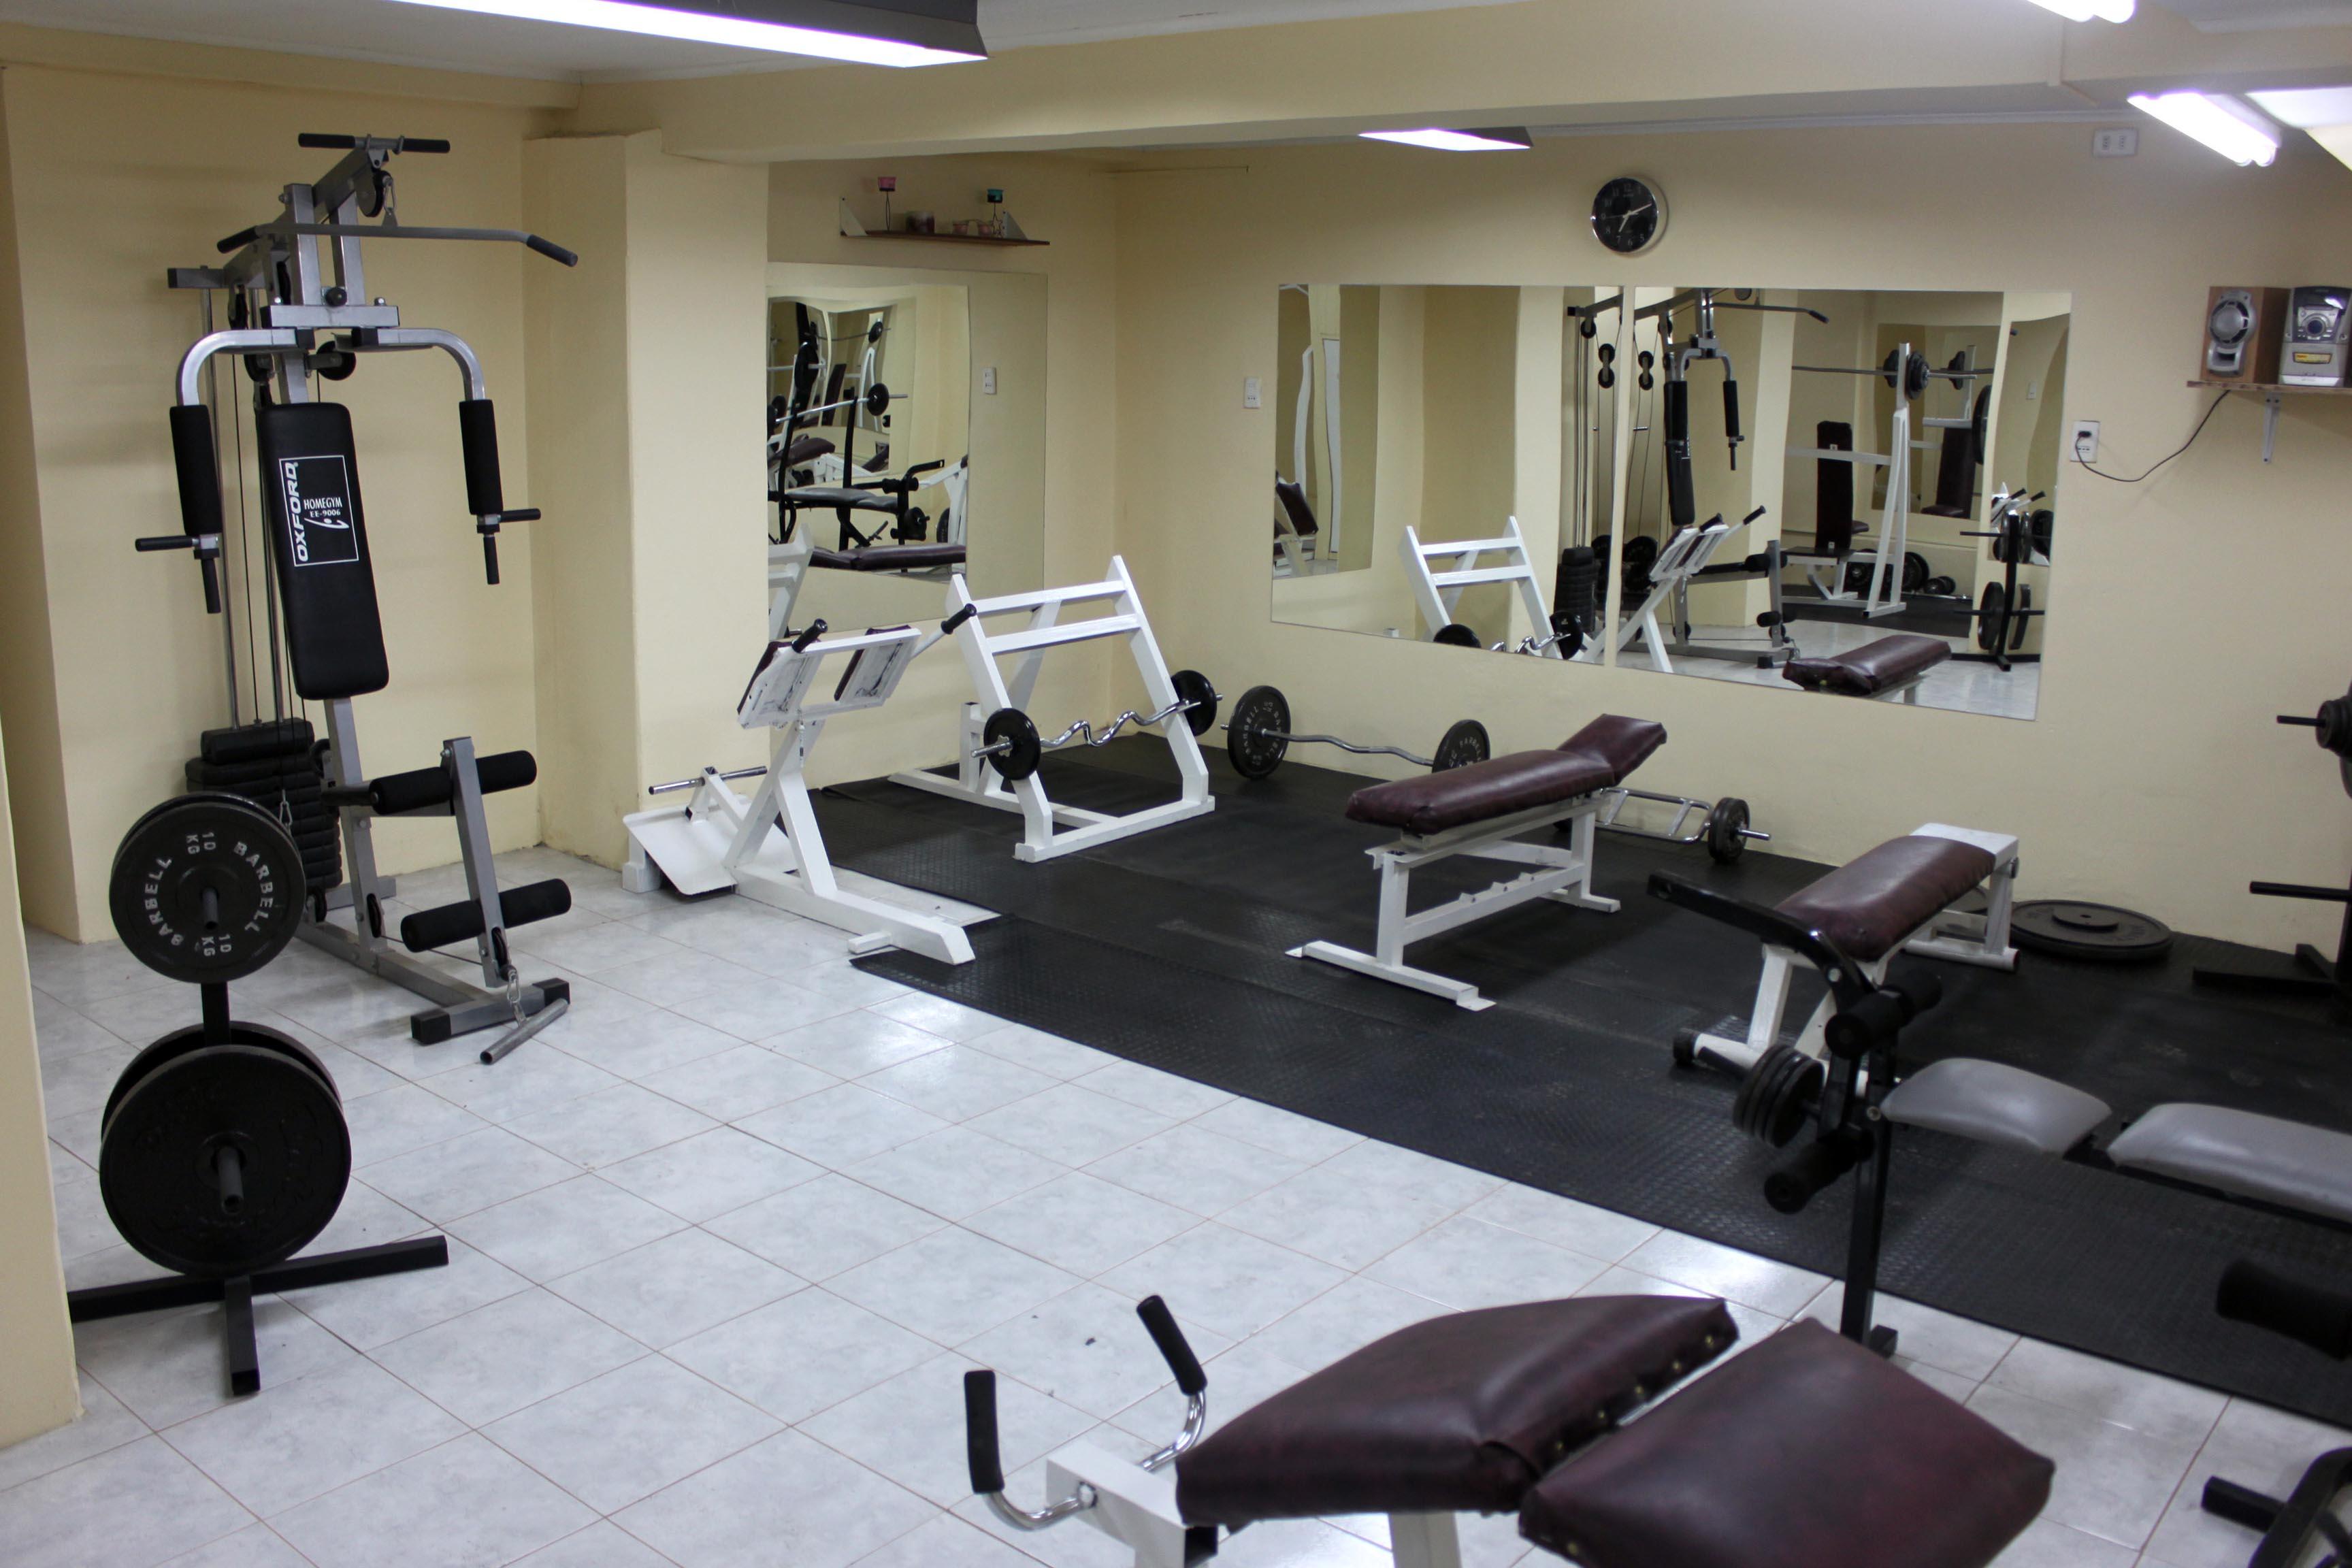 Nuevo gimnasio gym energy 42 abri sus puertas en punta for Gimnasio energy